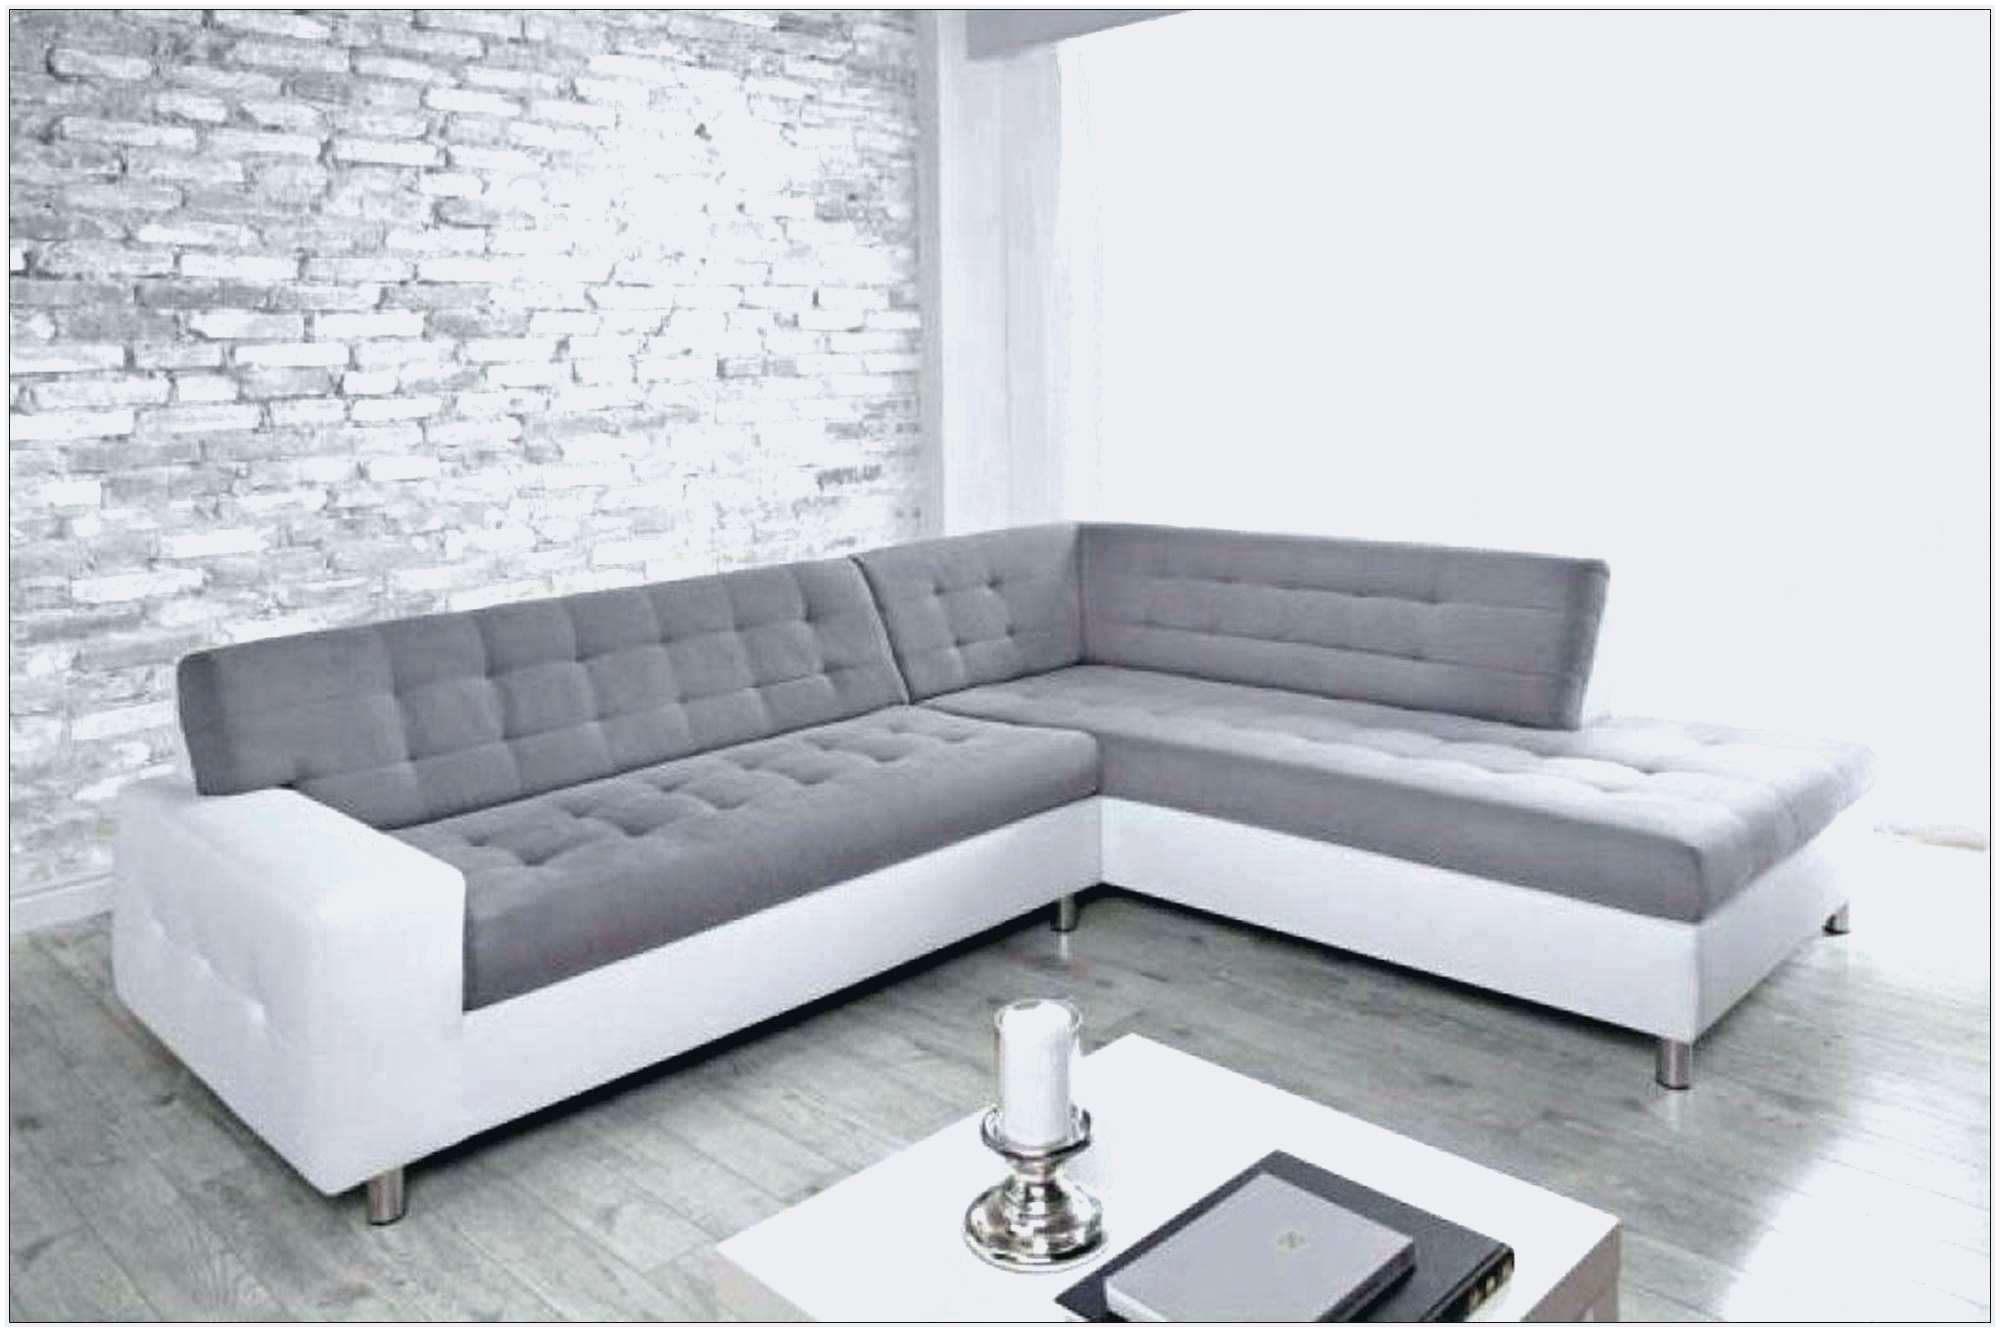 Luxe Ikea Canapé D Angle Convertible Beau Image Lit 2 Places 25 23